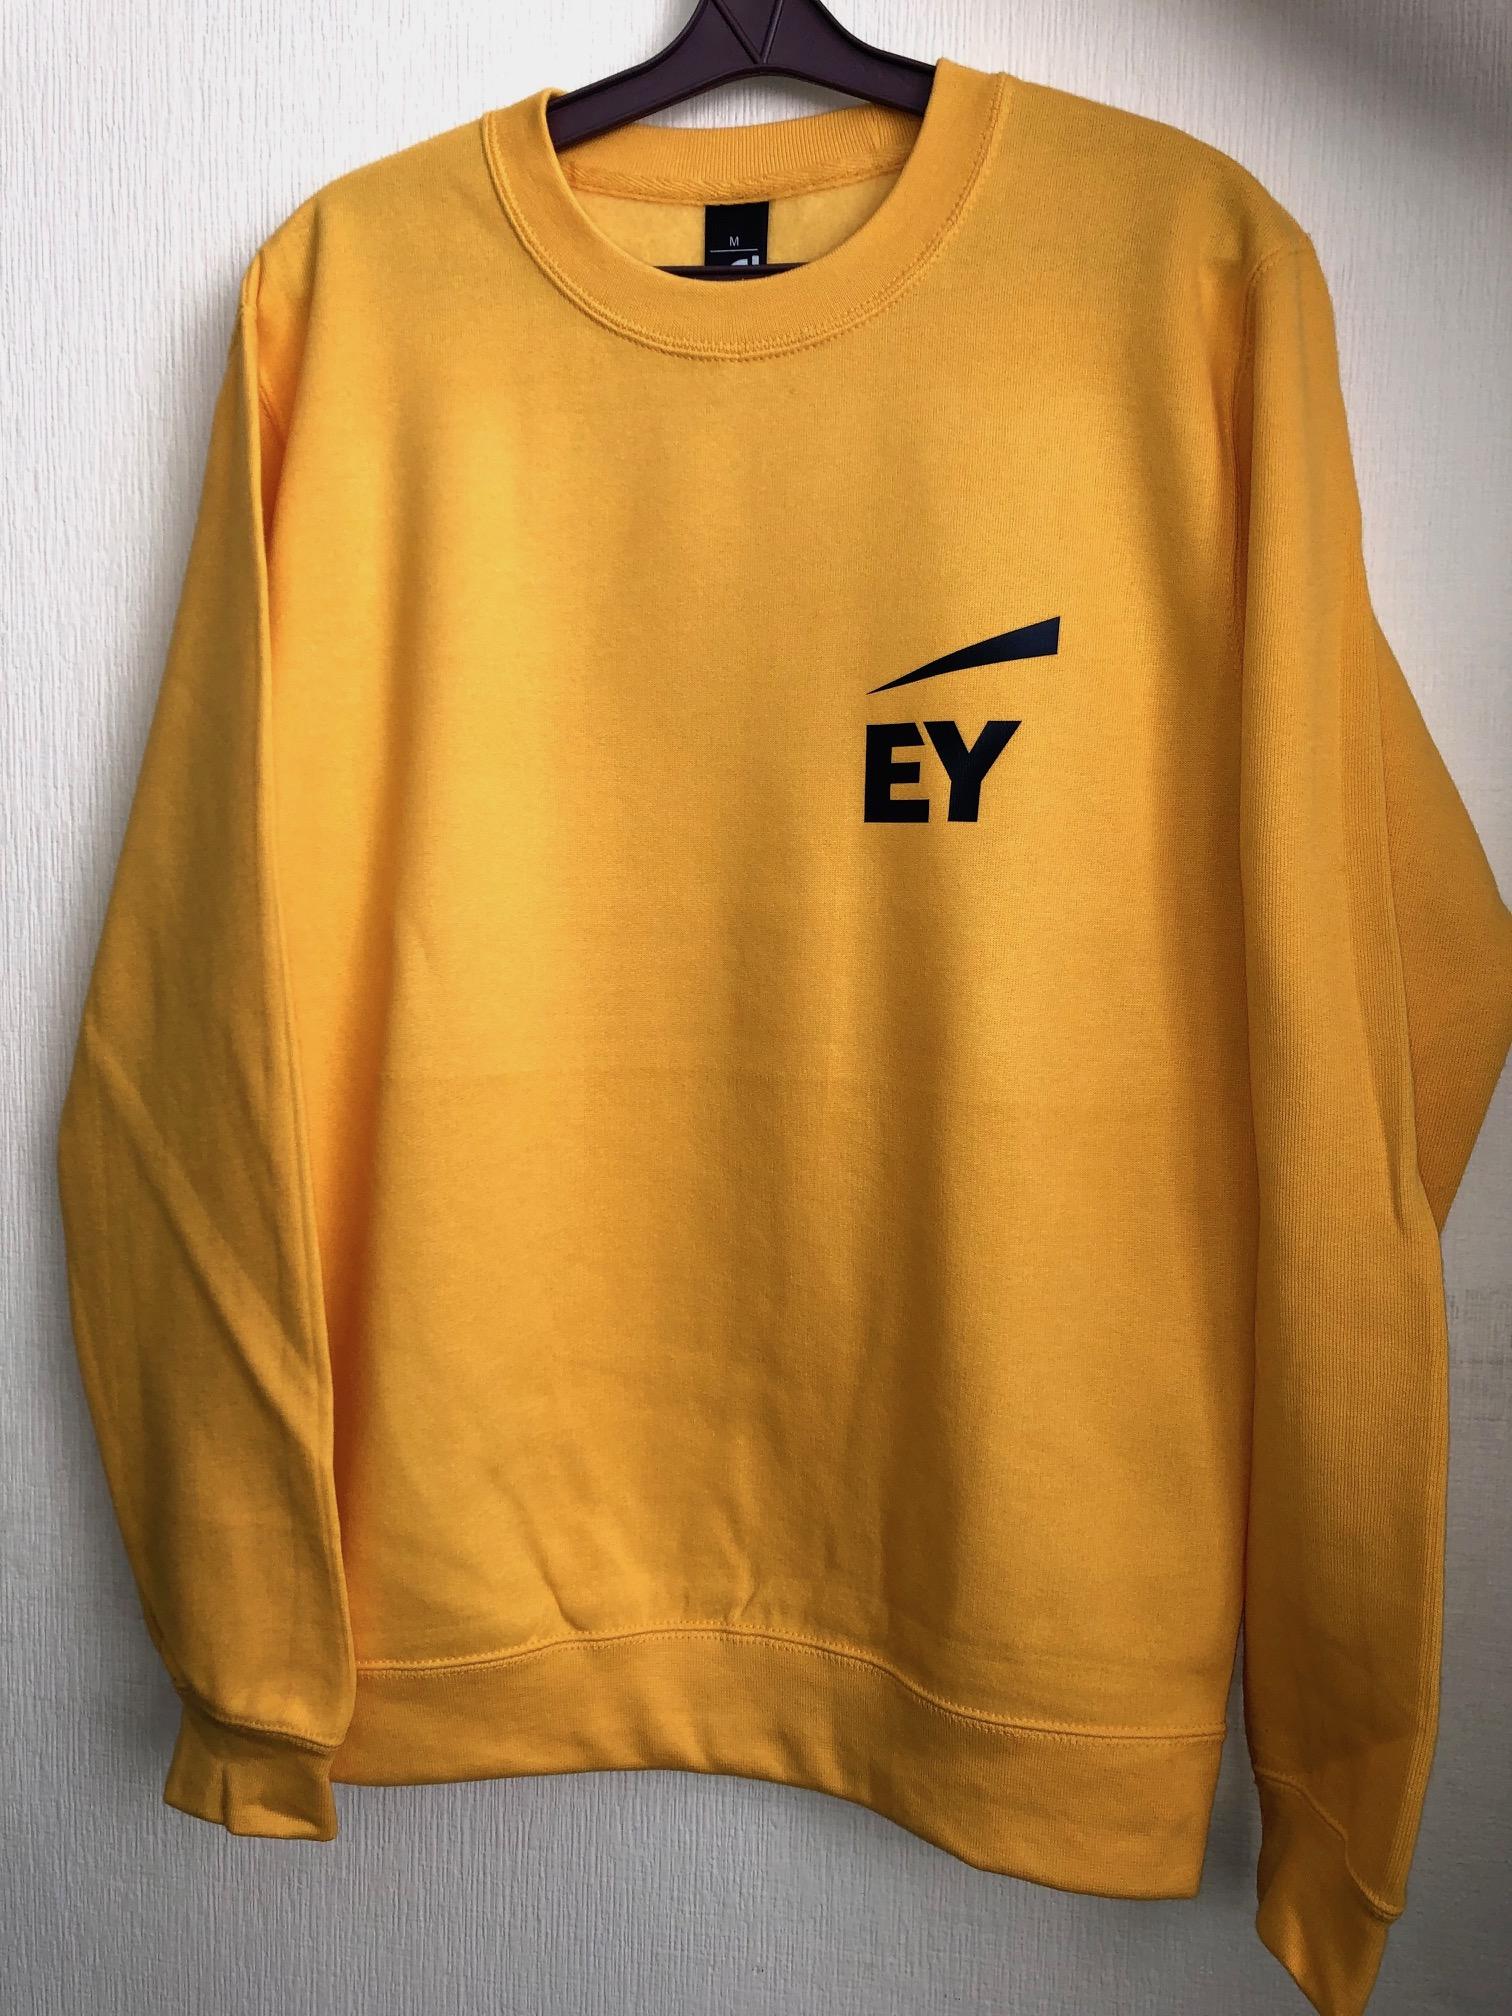 Sweatshirts with corporate logo